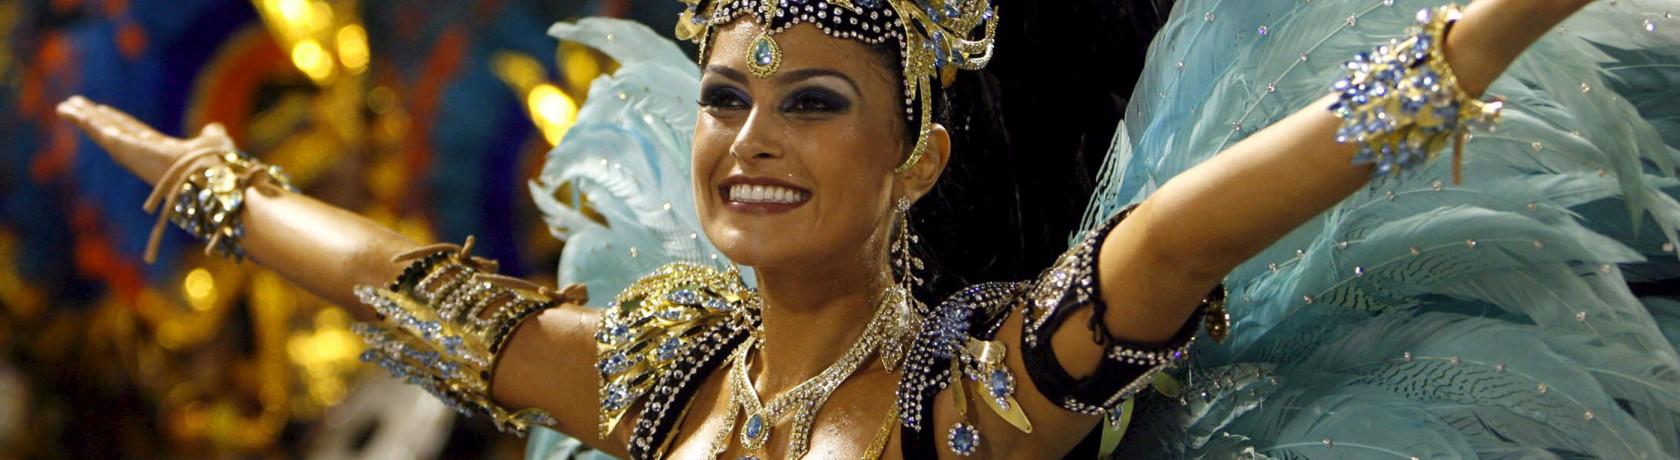 Brazil- Especial Samba Country